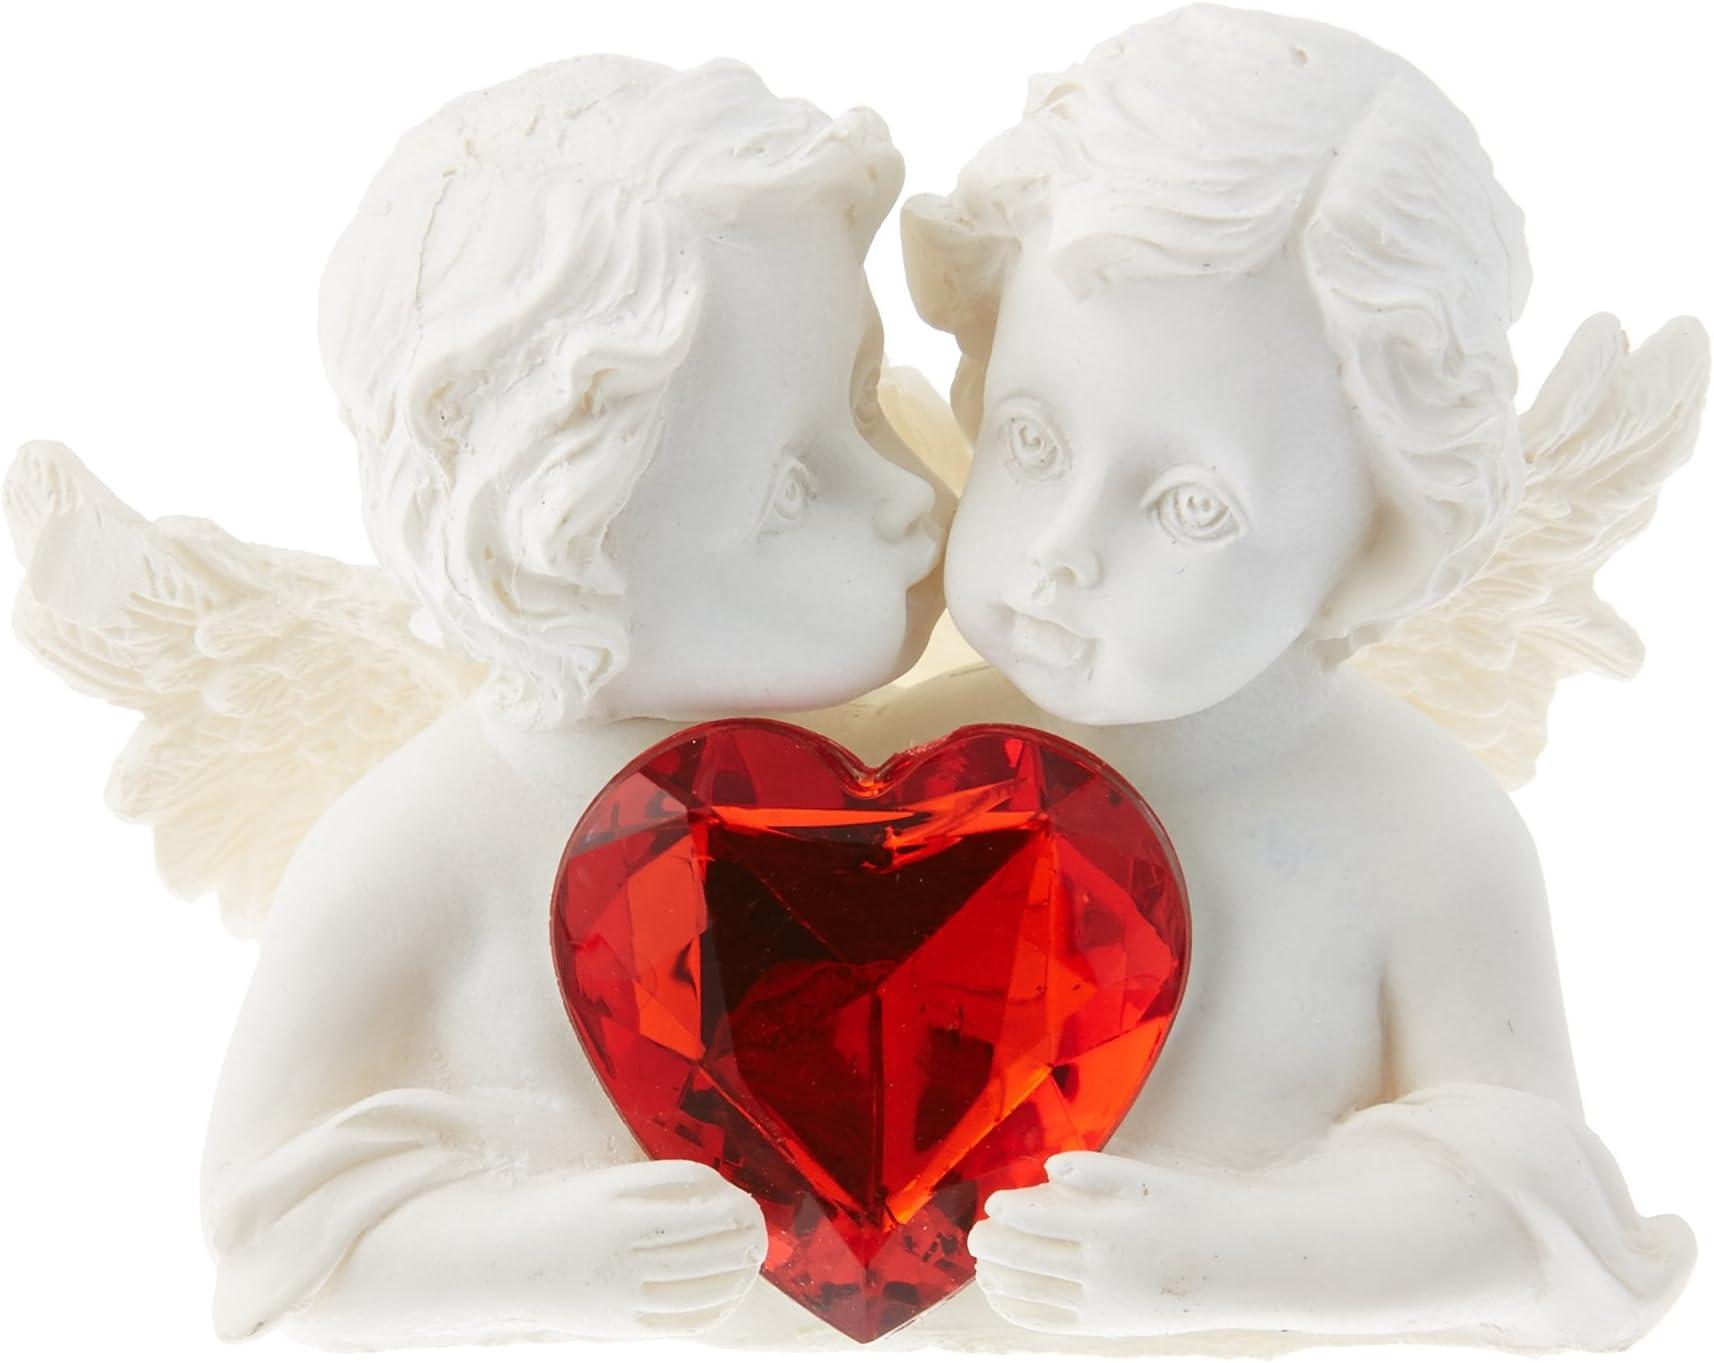 Angel Heart MEDIUM Shell Art Ornaments Cupid Cherubs Start at 23 US-Bud Vase Accents-Red Glass Hearts-Stocking Stuffer-Beach Wedding Favors